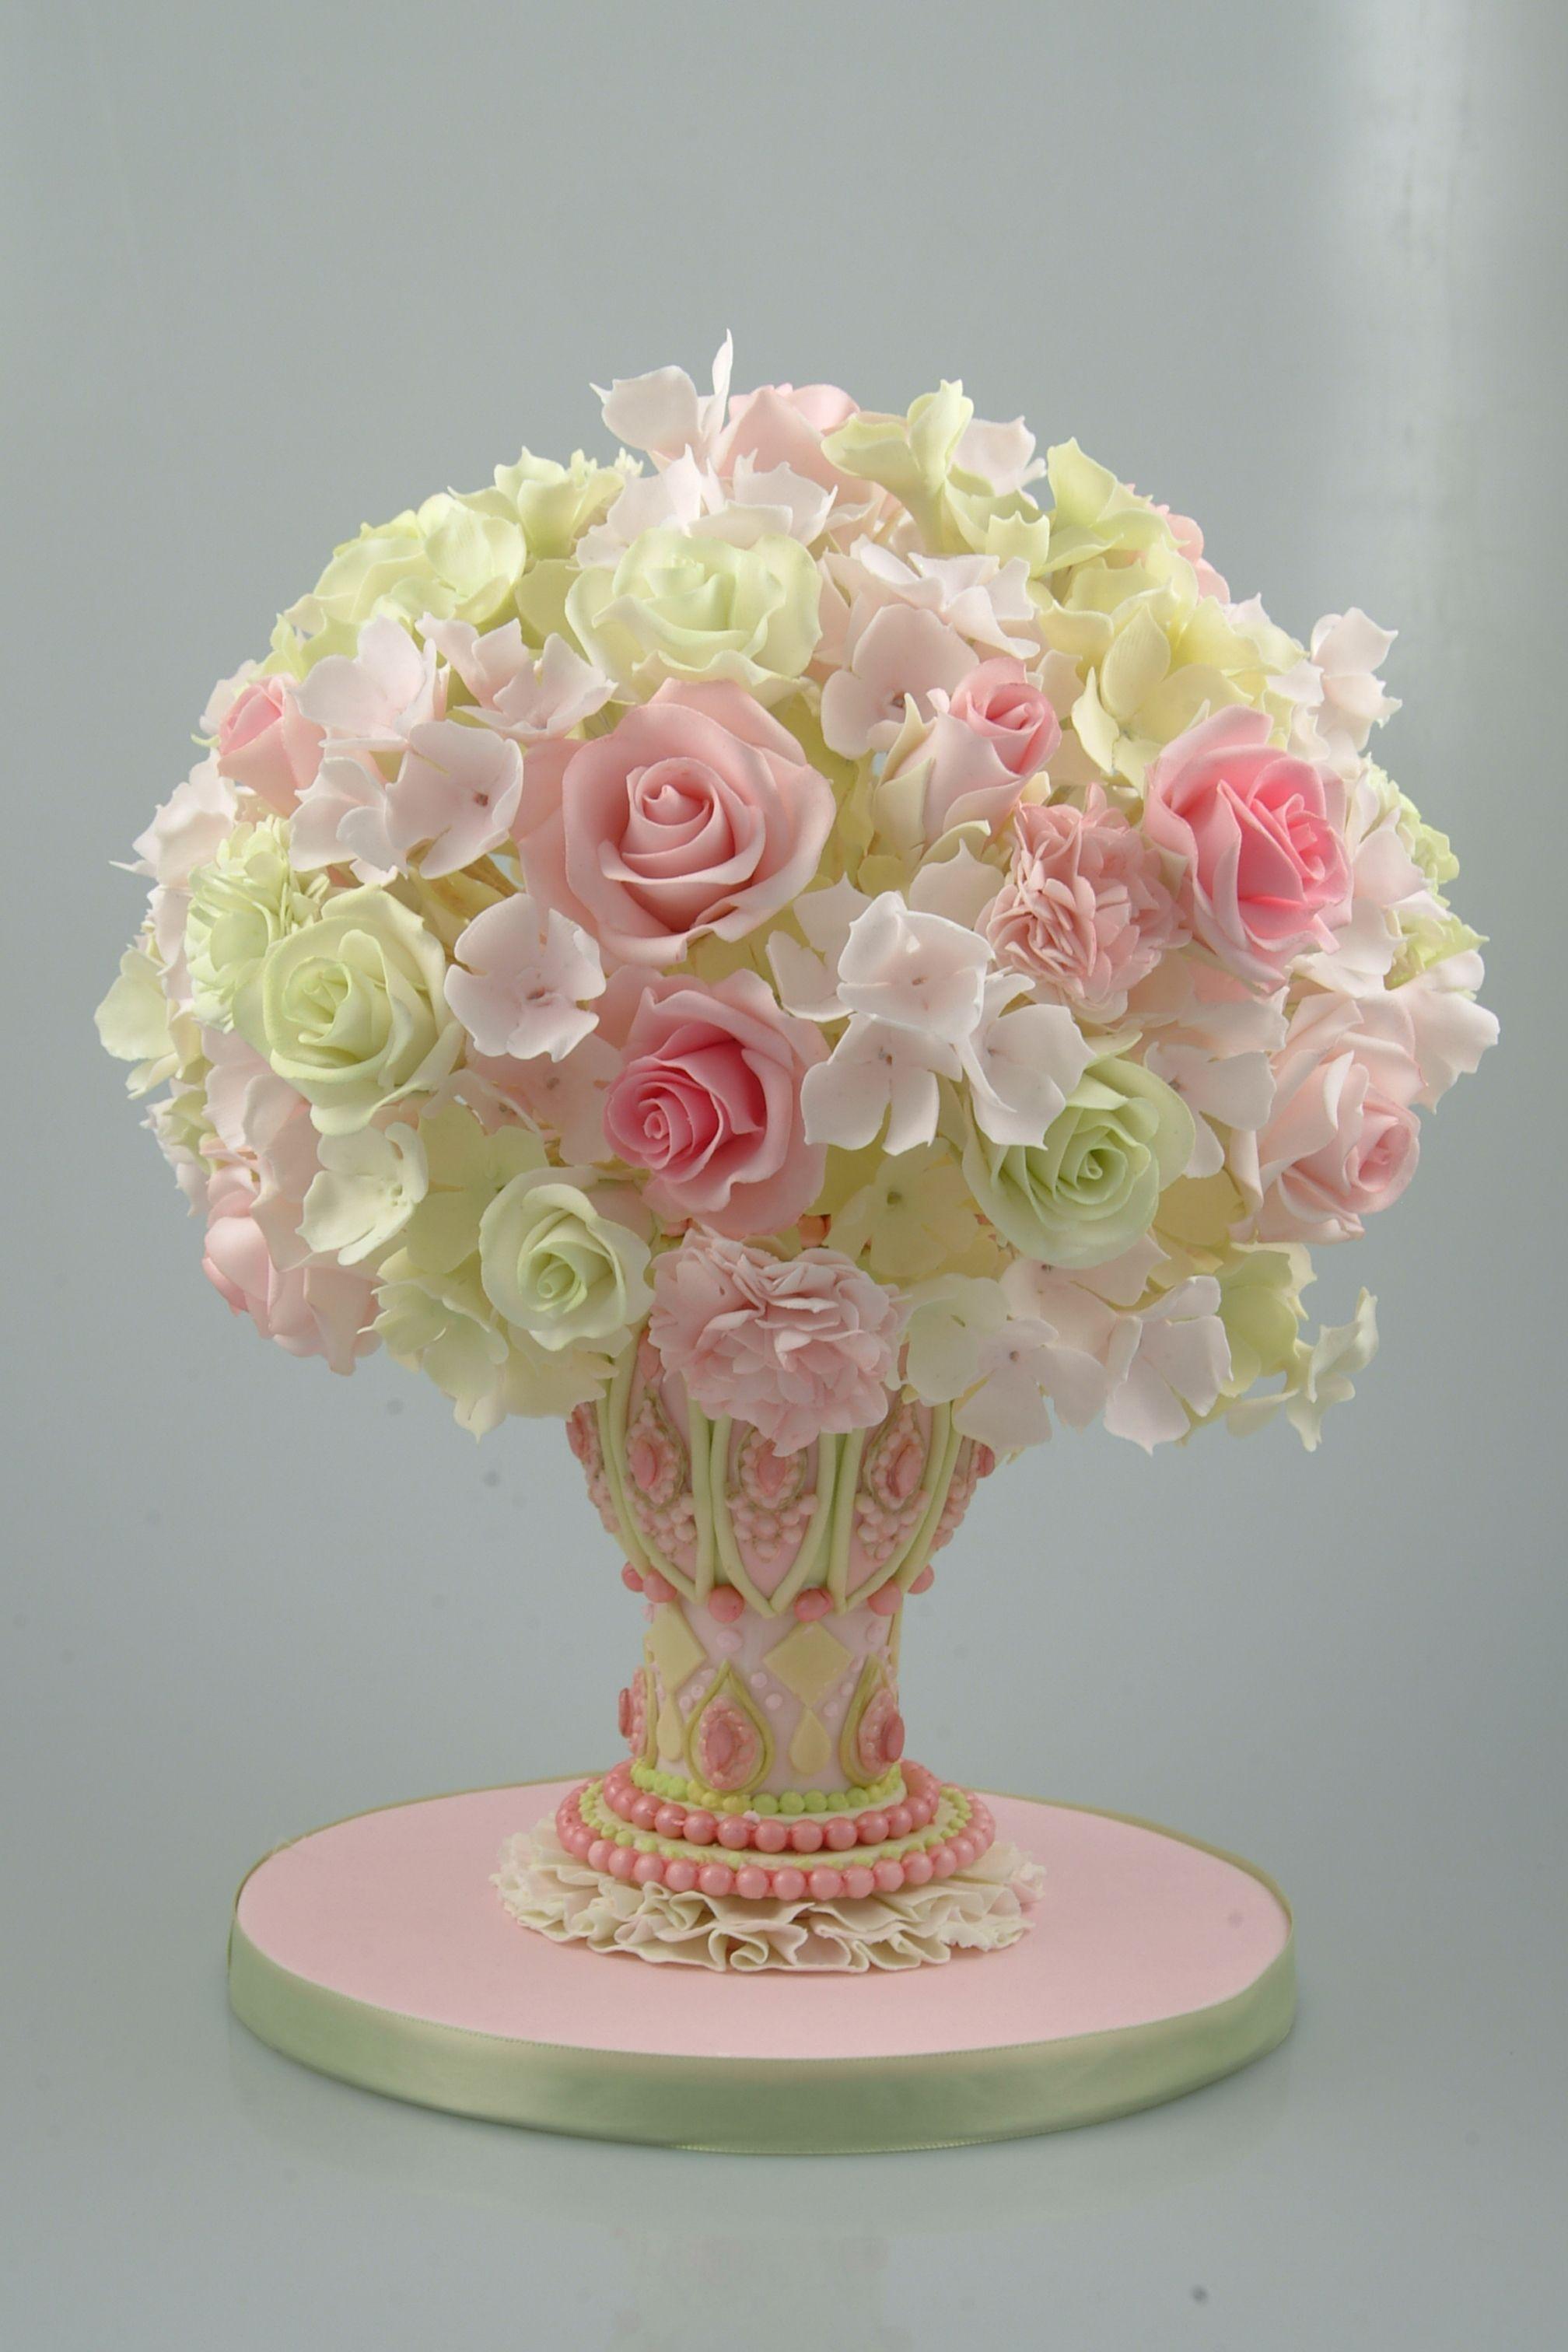 List Of Pinterest Suger Flowers Arrangements Cakes Pictures